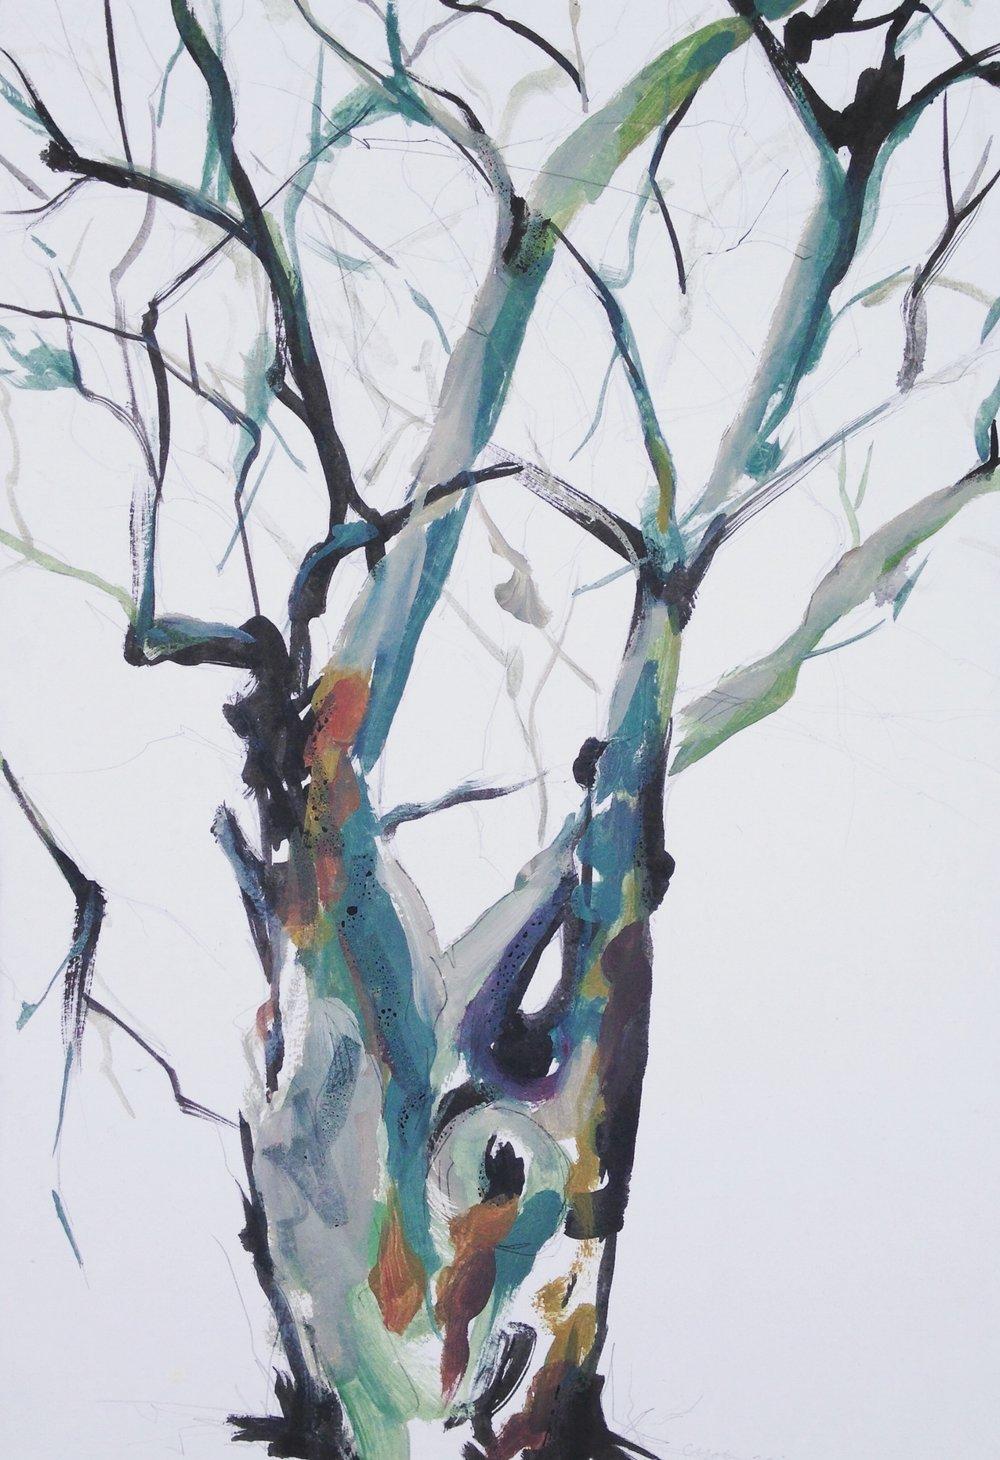 Winter tree study II